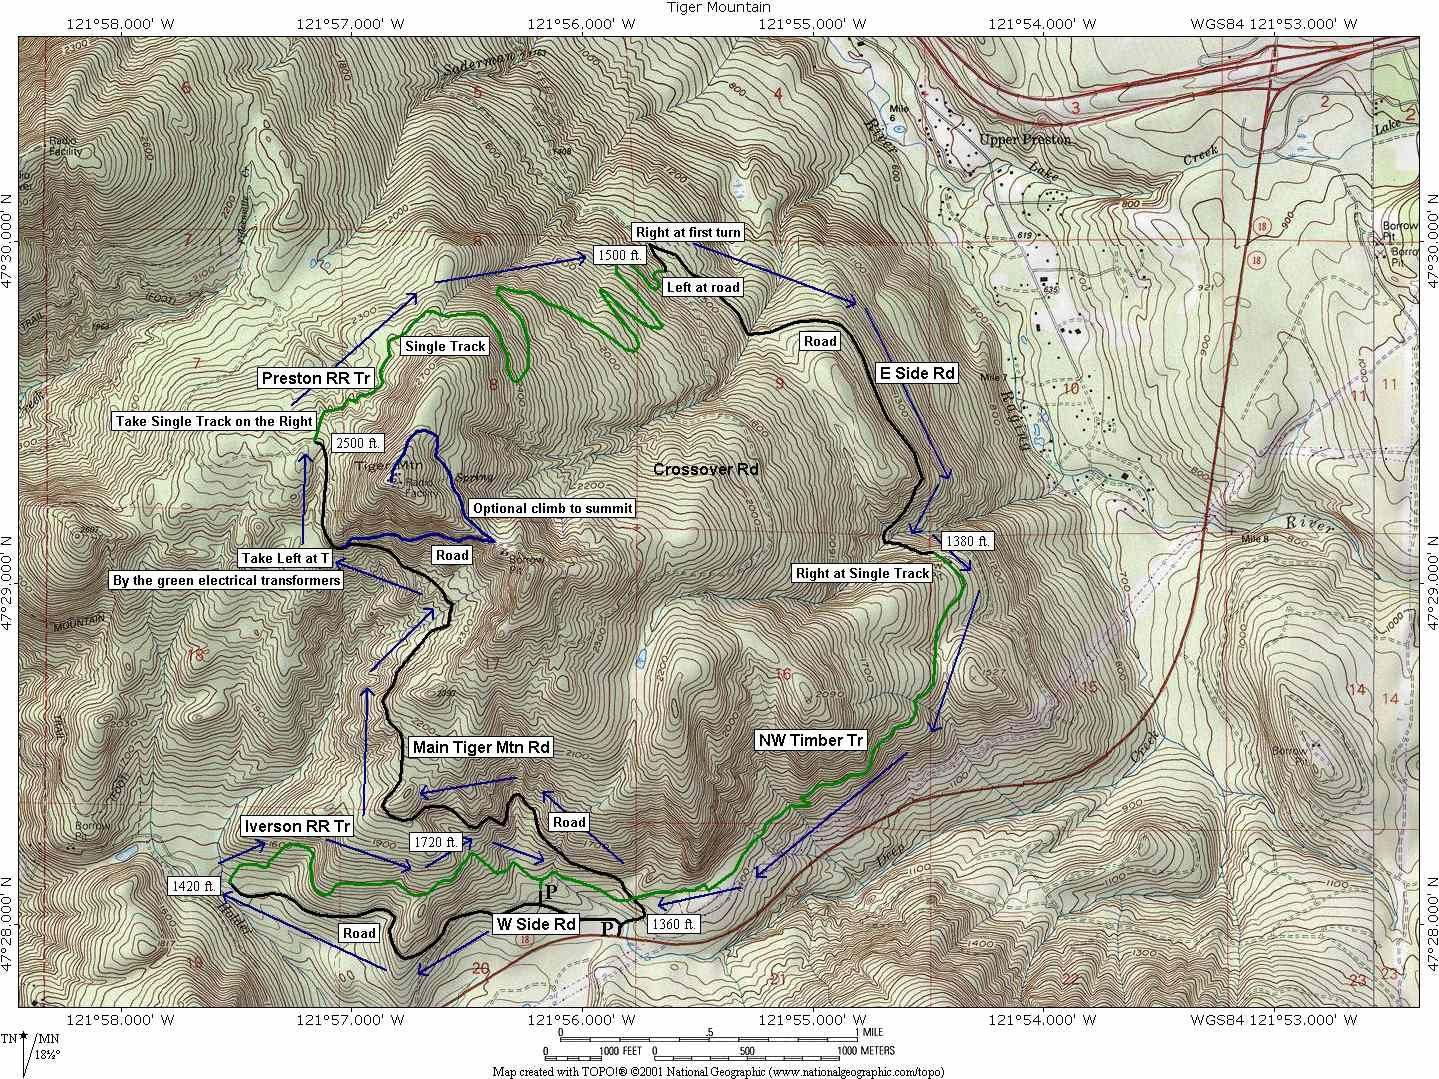 preston rail road | Tiger Mountain - Preston Railroad Trail &Northwest Timber Trail